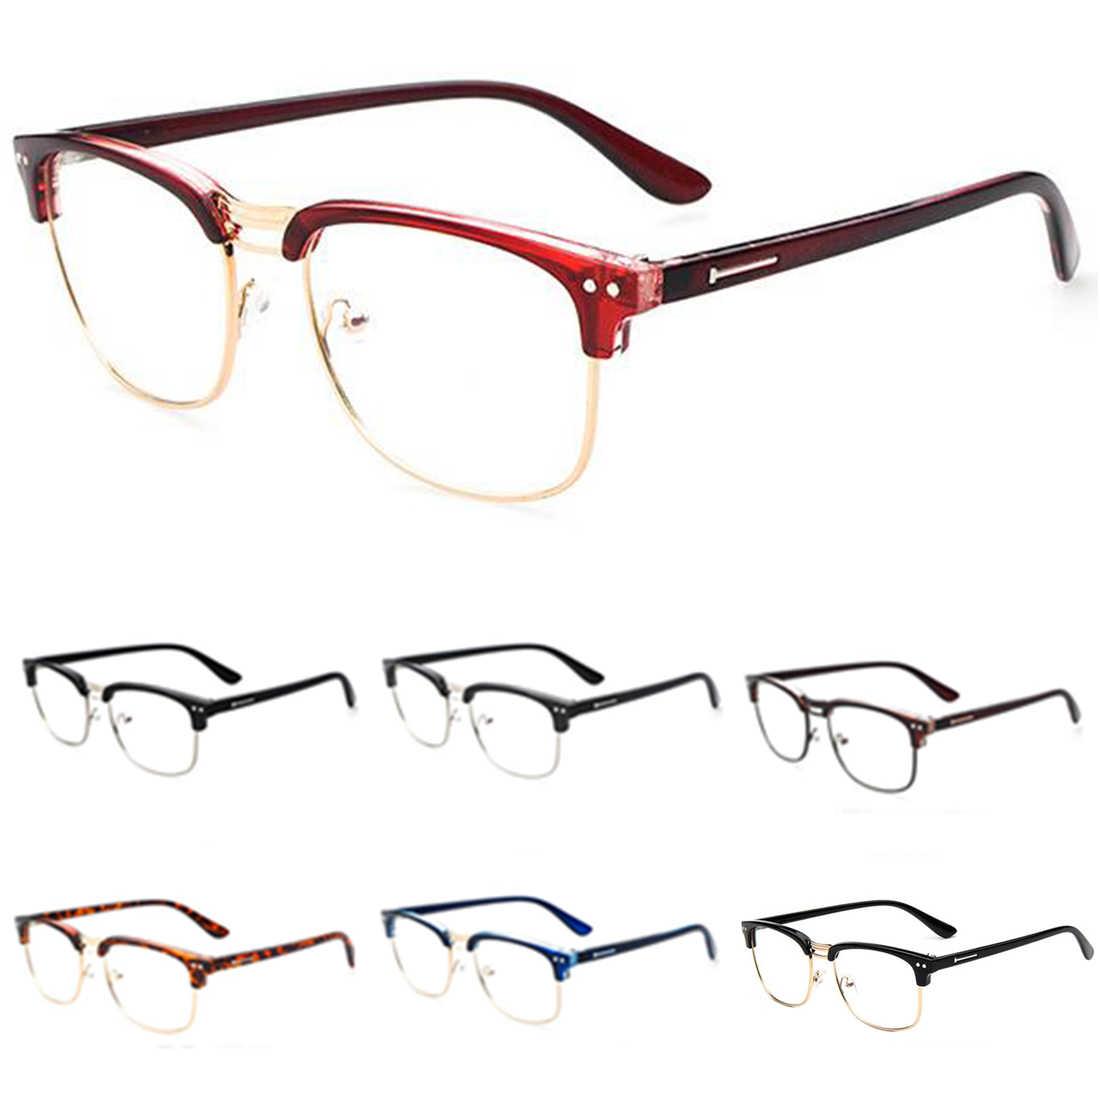 5f2c685689d 2017 Fashion Metal Half Frame Glasses Frame Retro Women Men Reading Glass  UV Protection Clear Lens